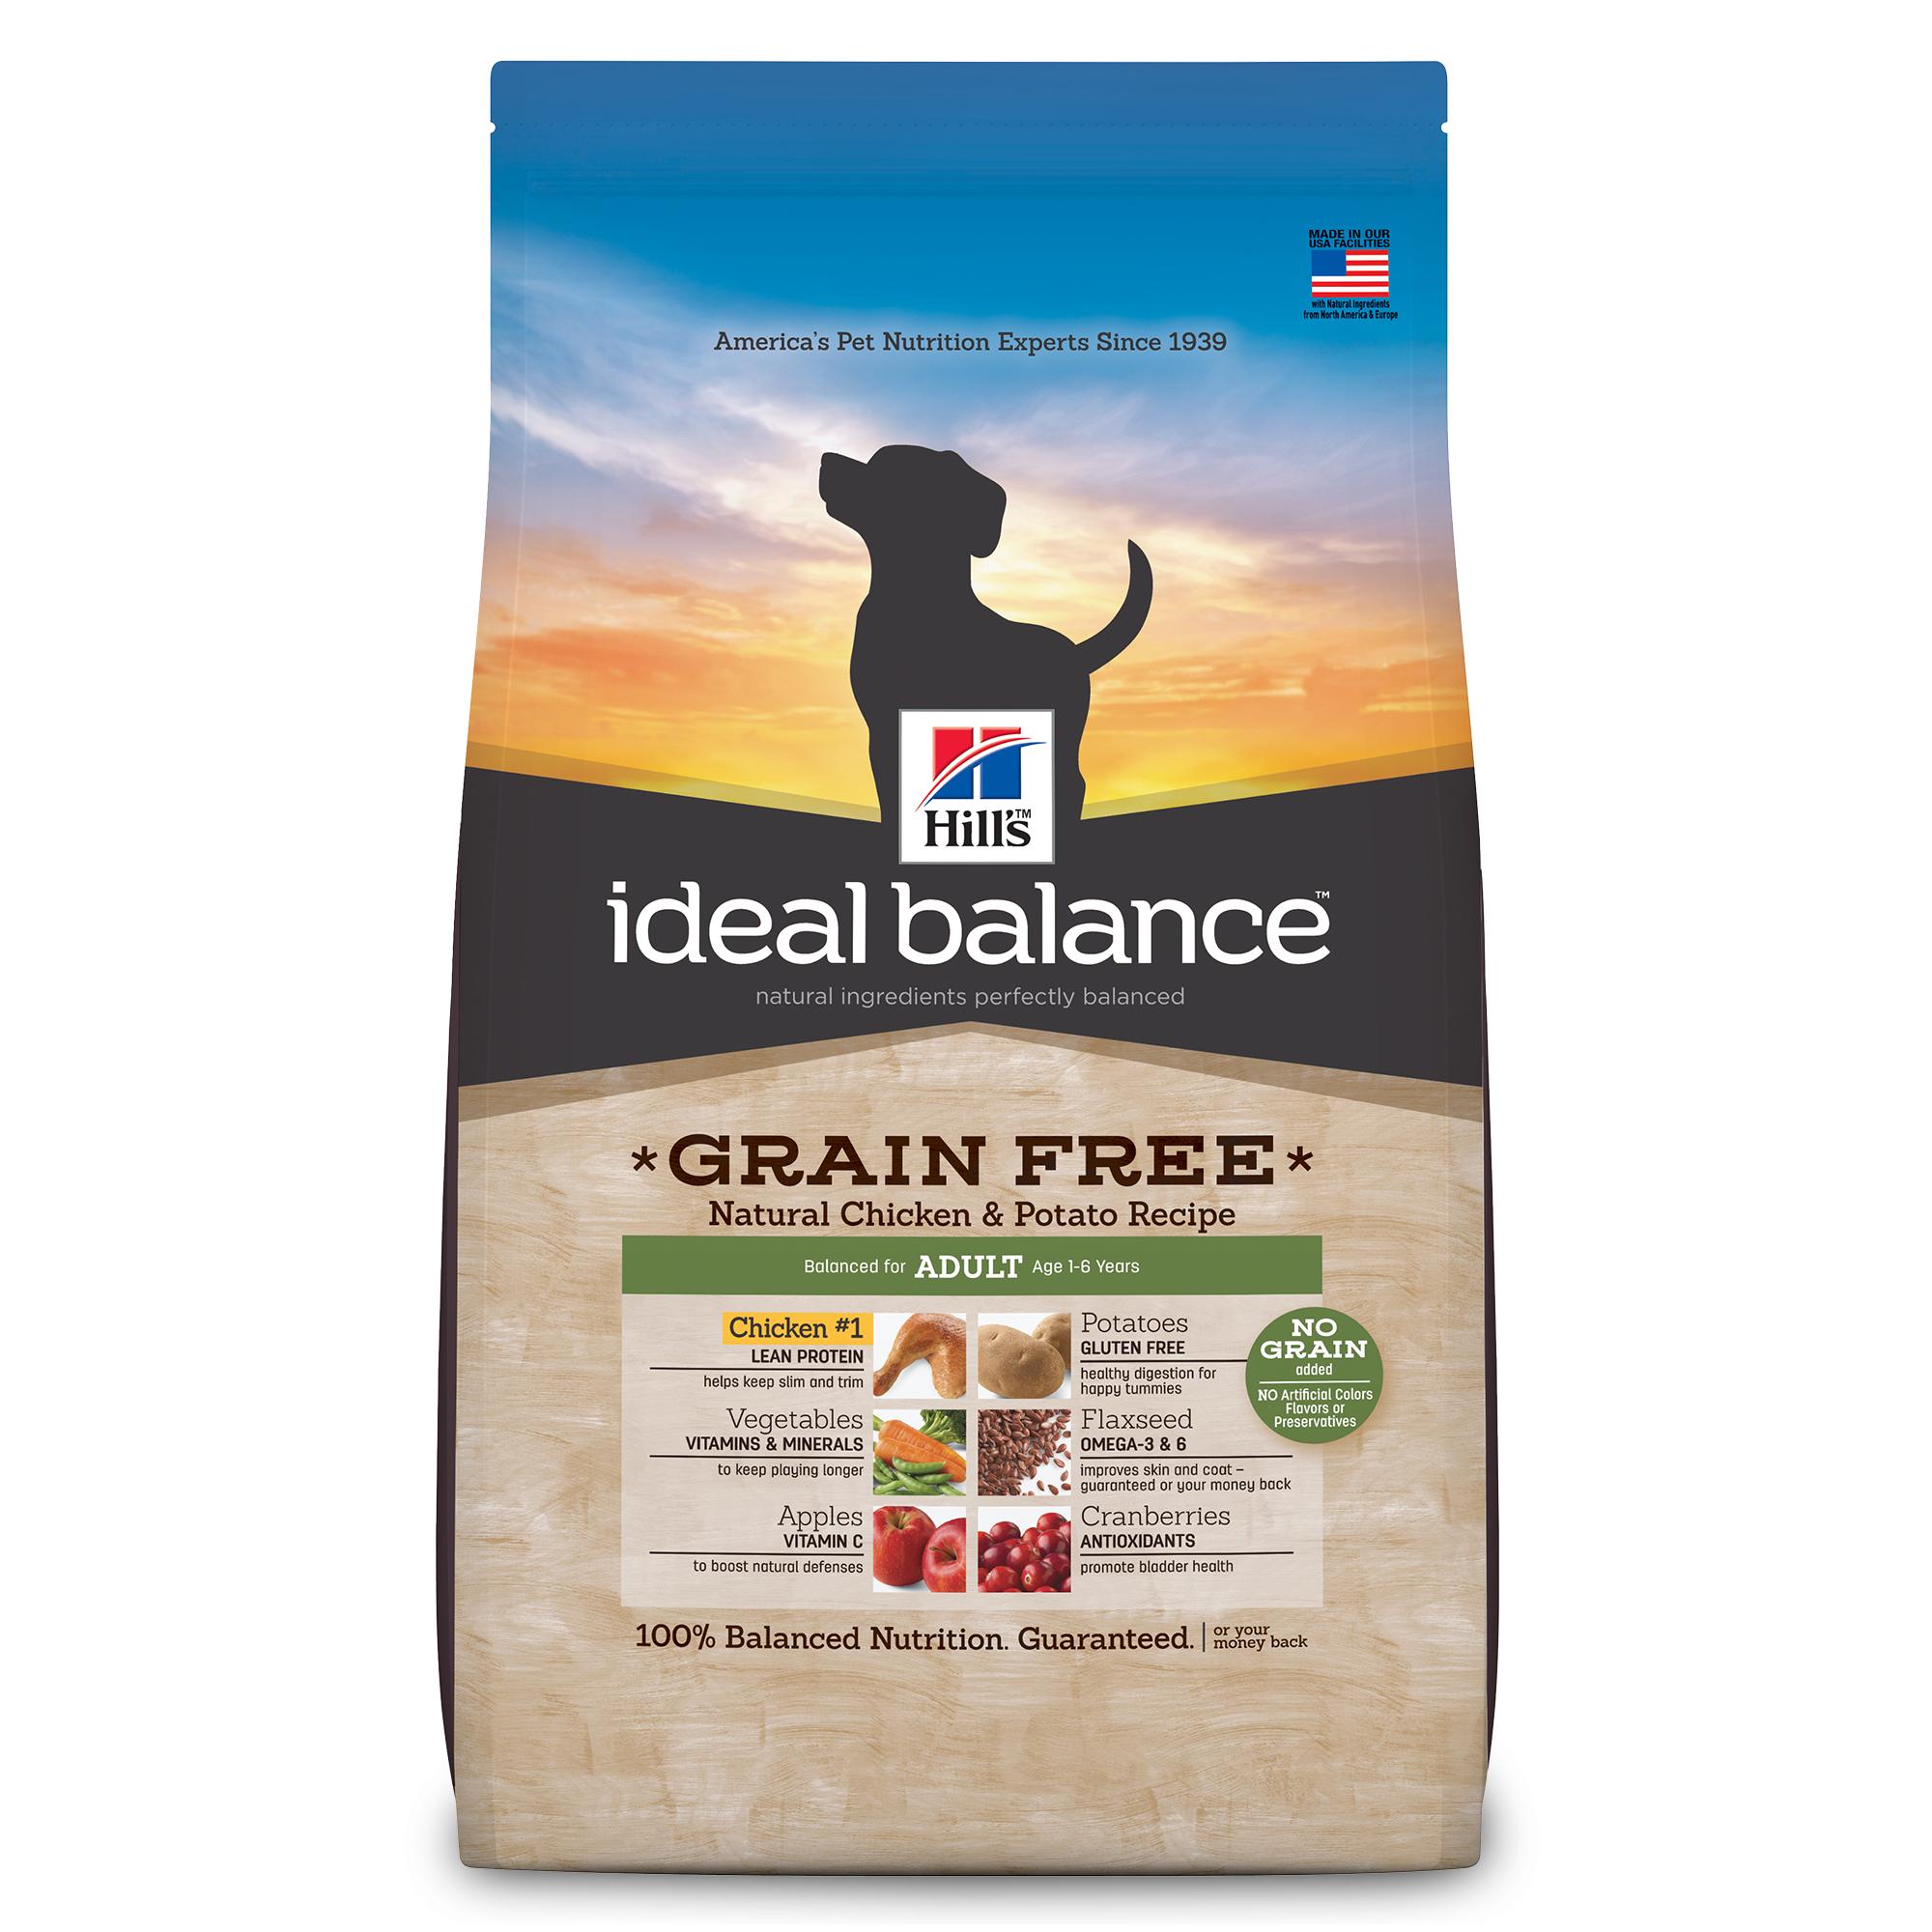 Hill's Ideal Balance (Spend $20,Get $5) Adult Grain Free Natural Chicken & Potato Dry Dog Food, 21 lb bag (See description for rebate details)